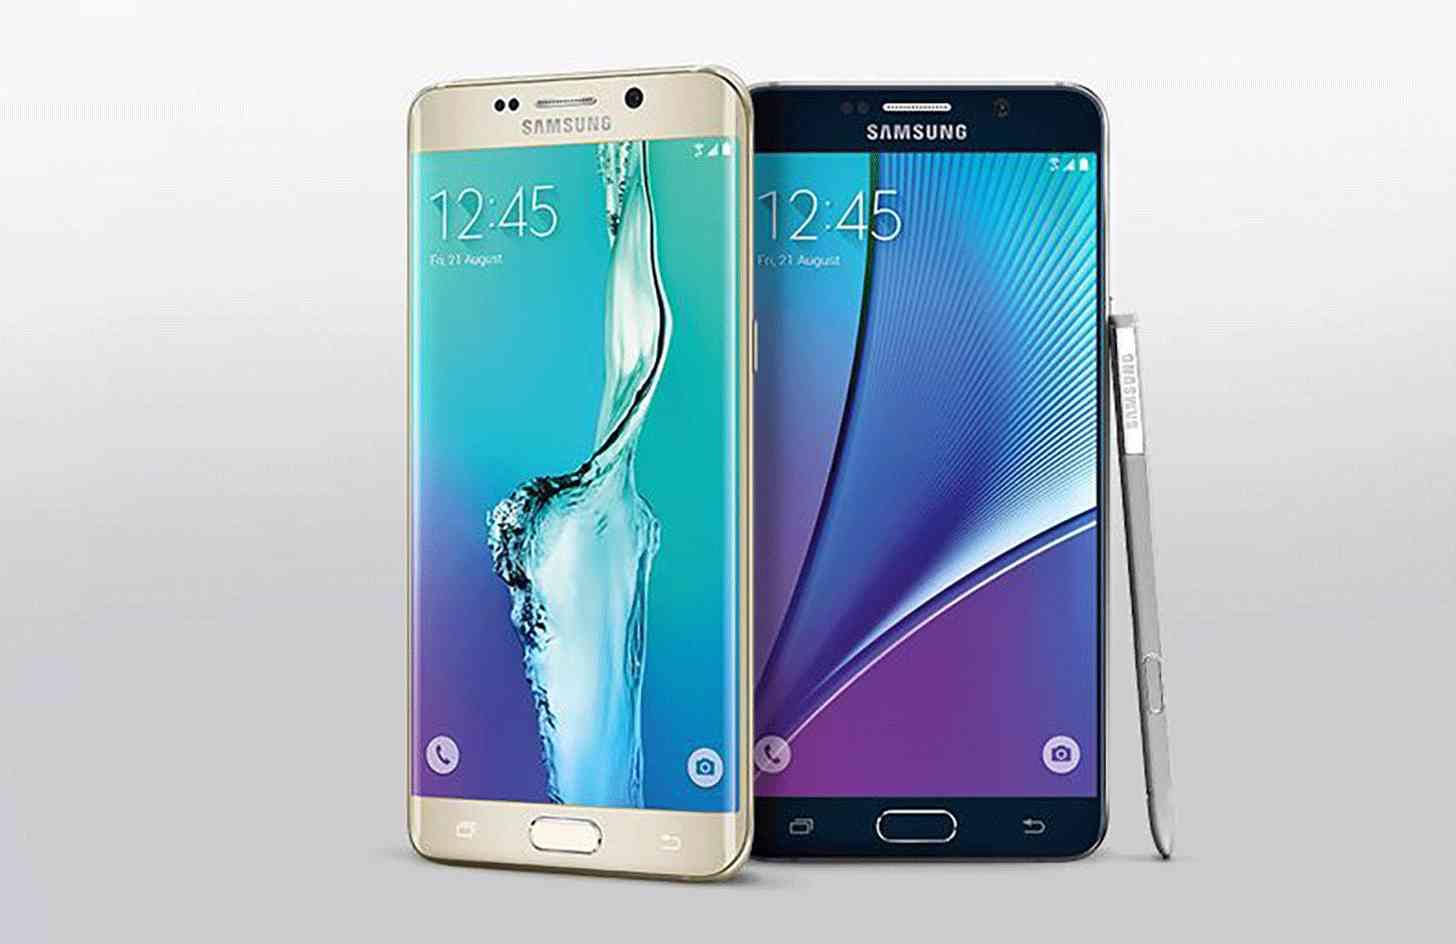 Samsung Galaxy Note 5 S6 edge+ large